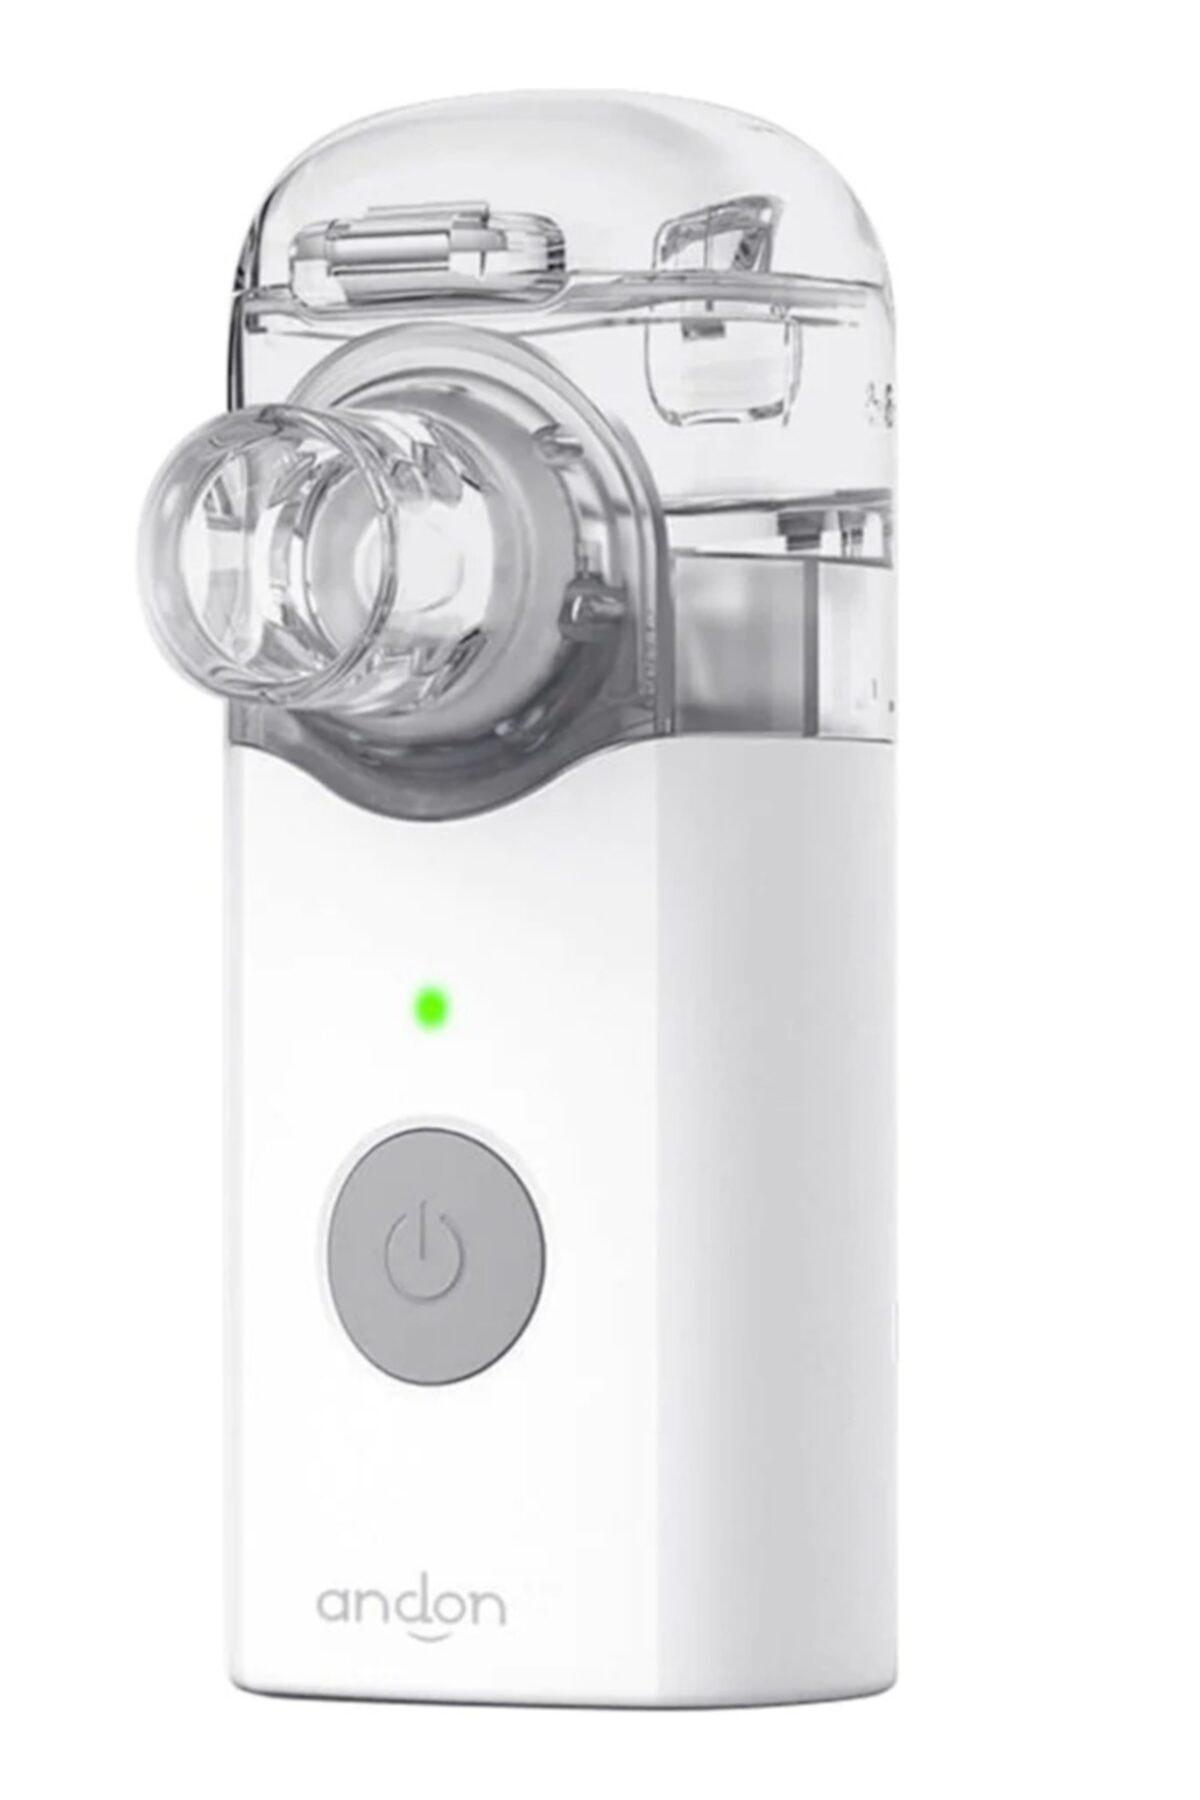 Xiaomi Andon Nebulizatör Taşınabilir Sıvı Buharlaştırıcı Cihaz 1